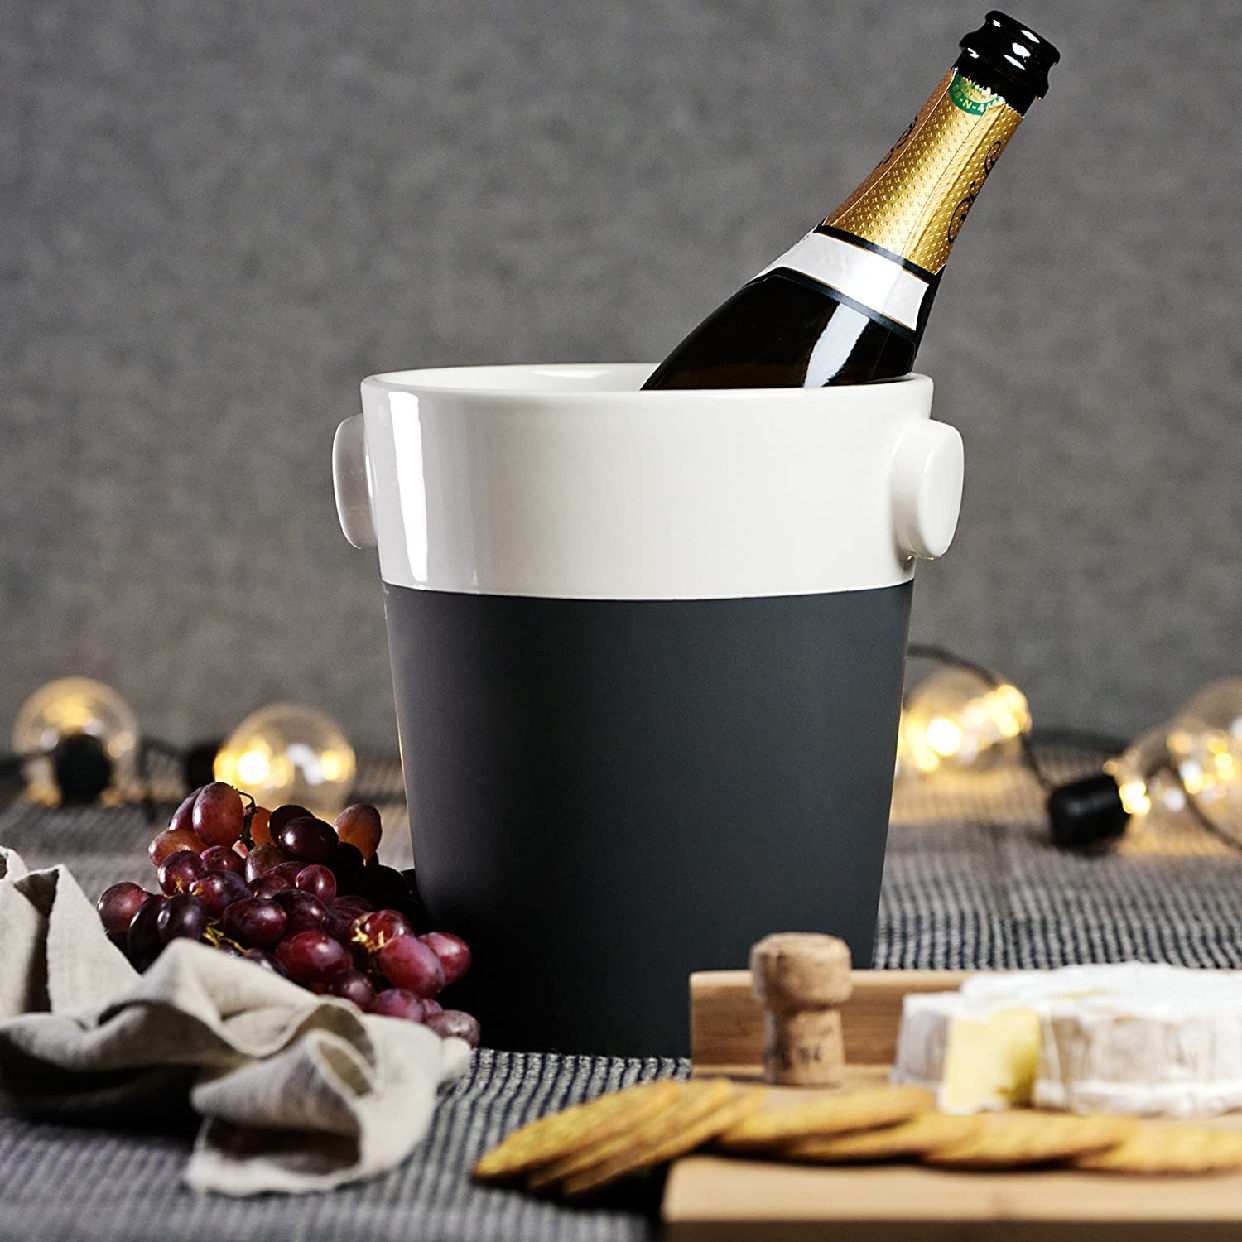 Magisso(マギソ) シャンパンクーラー ホワイトライン 70636の商品画像